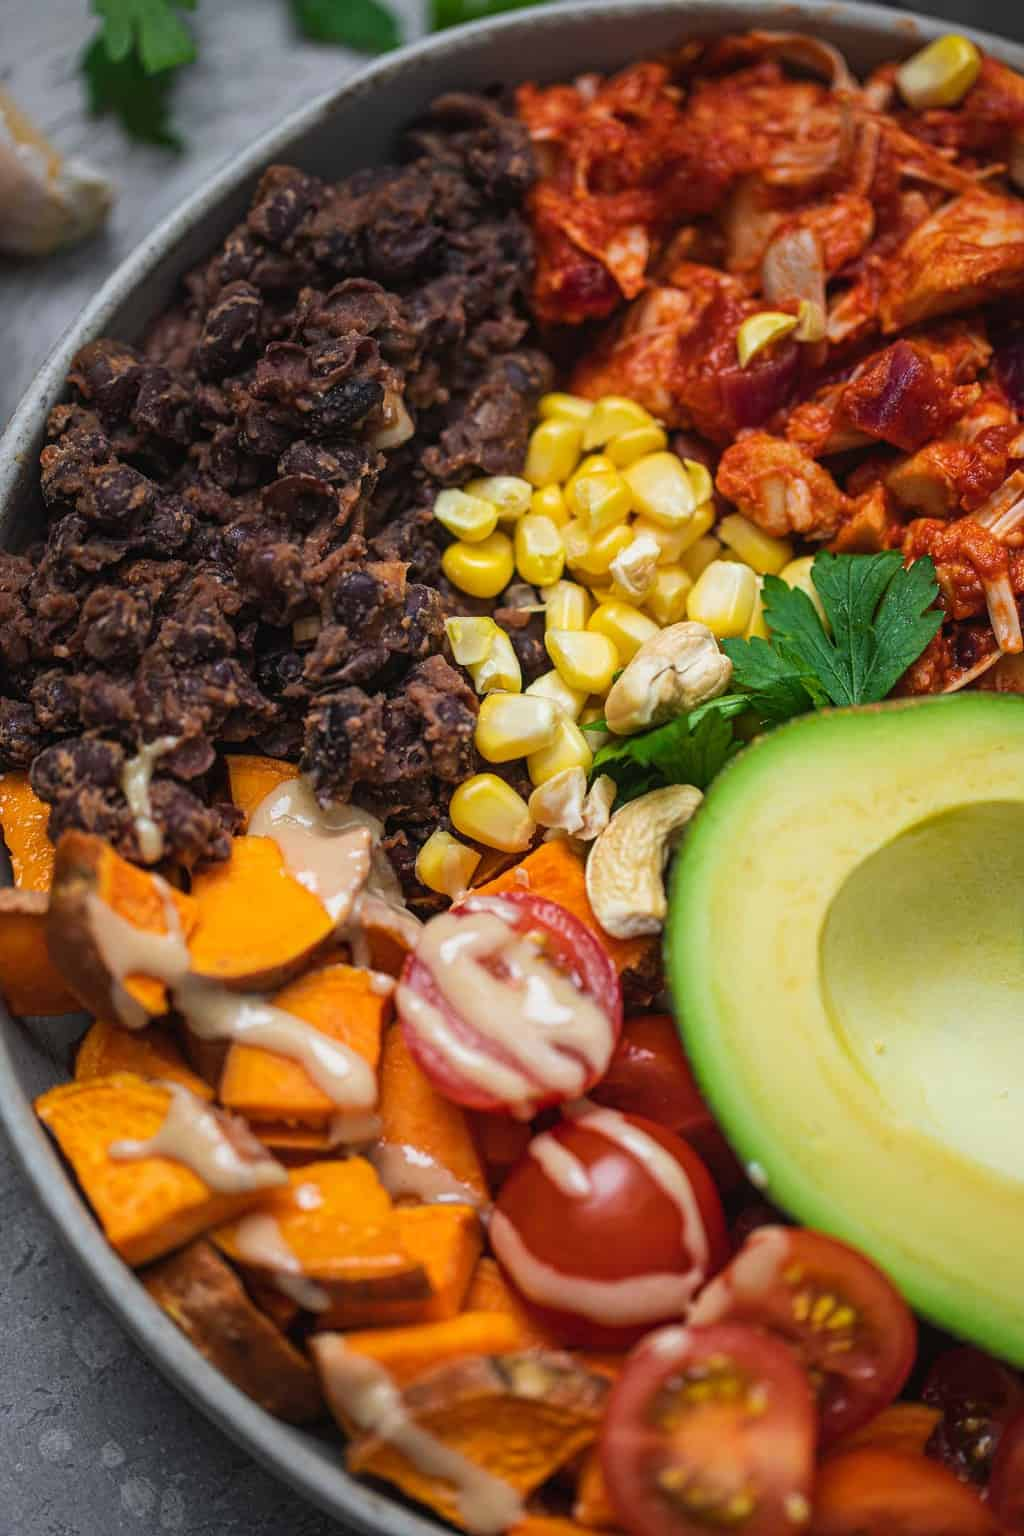 Closeup of a bowl with black beans, jackfruit, sweet potatoes, avocado and corn